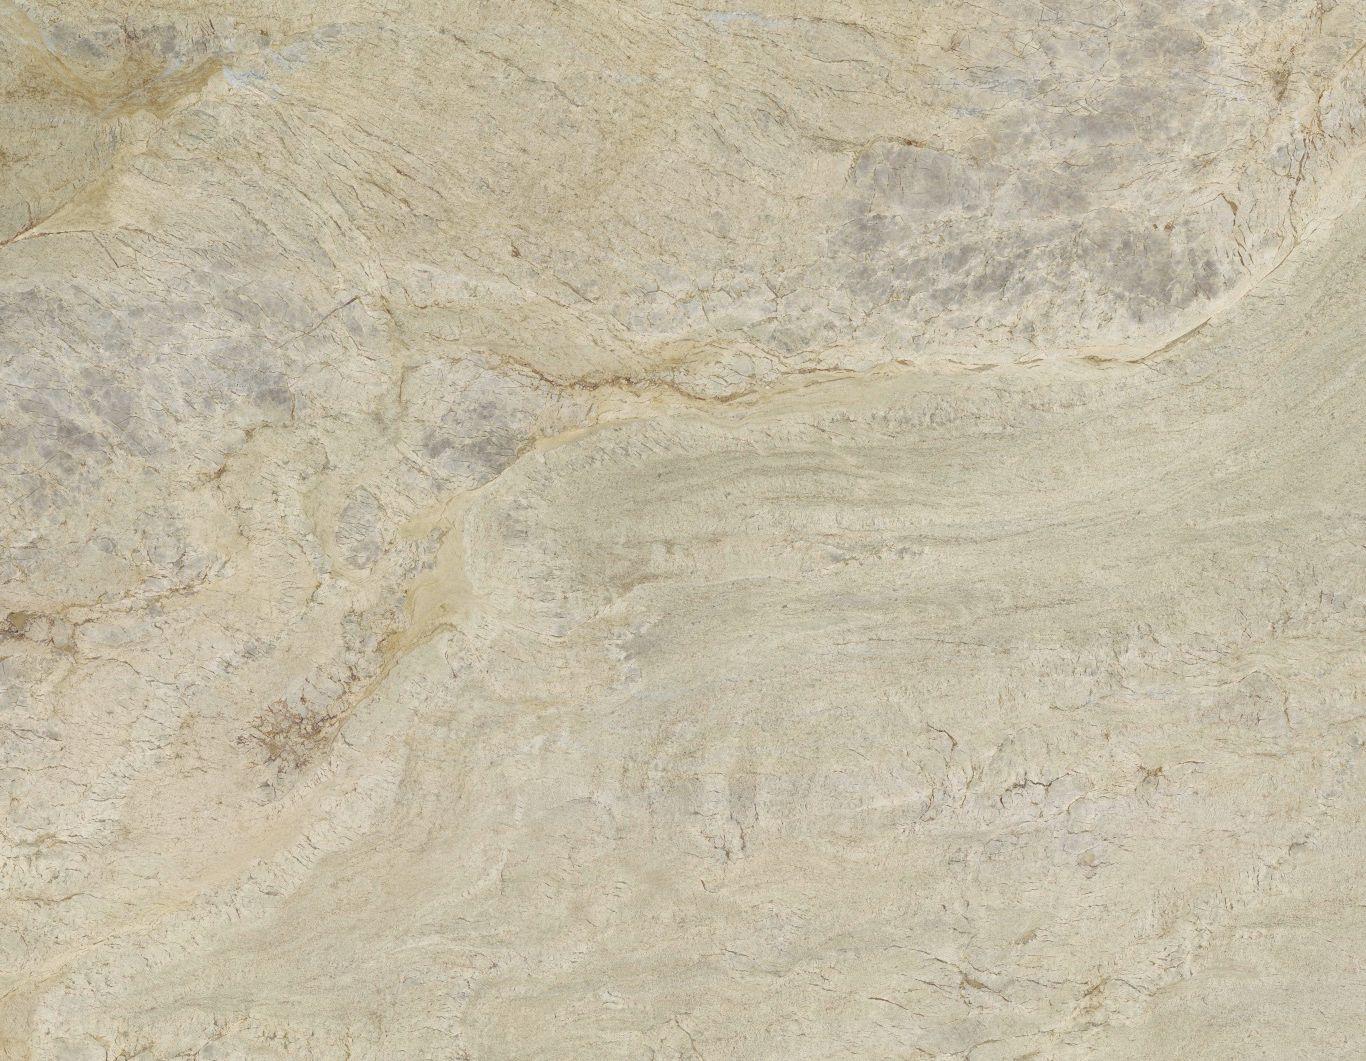 Pin by 王思伟 on 大理石贴图 Hardwood floors, Hardwood, Texture